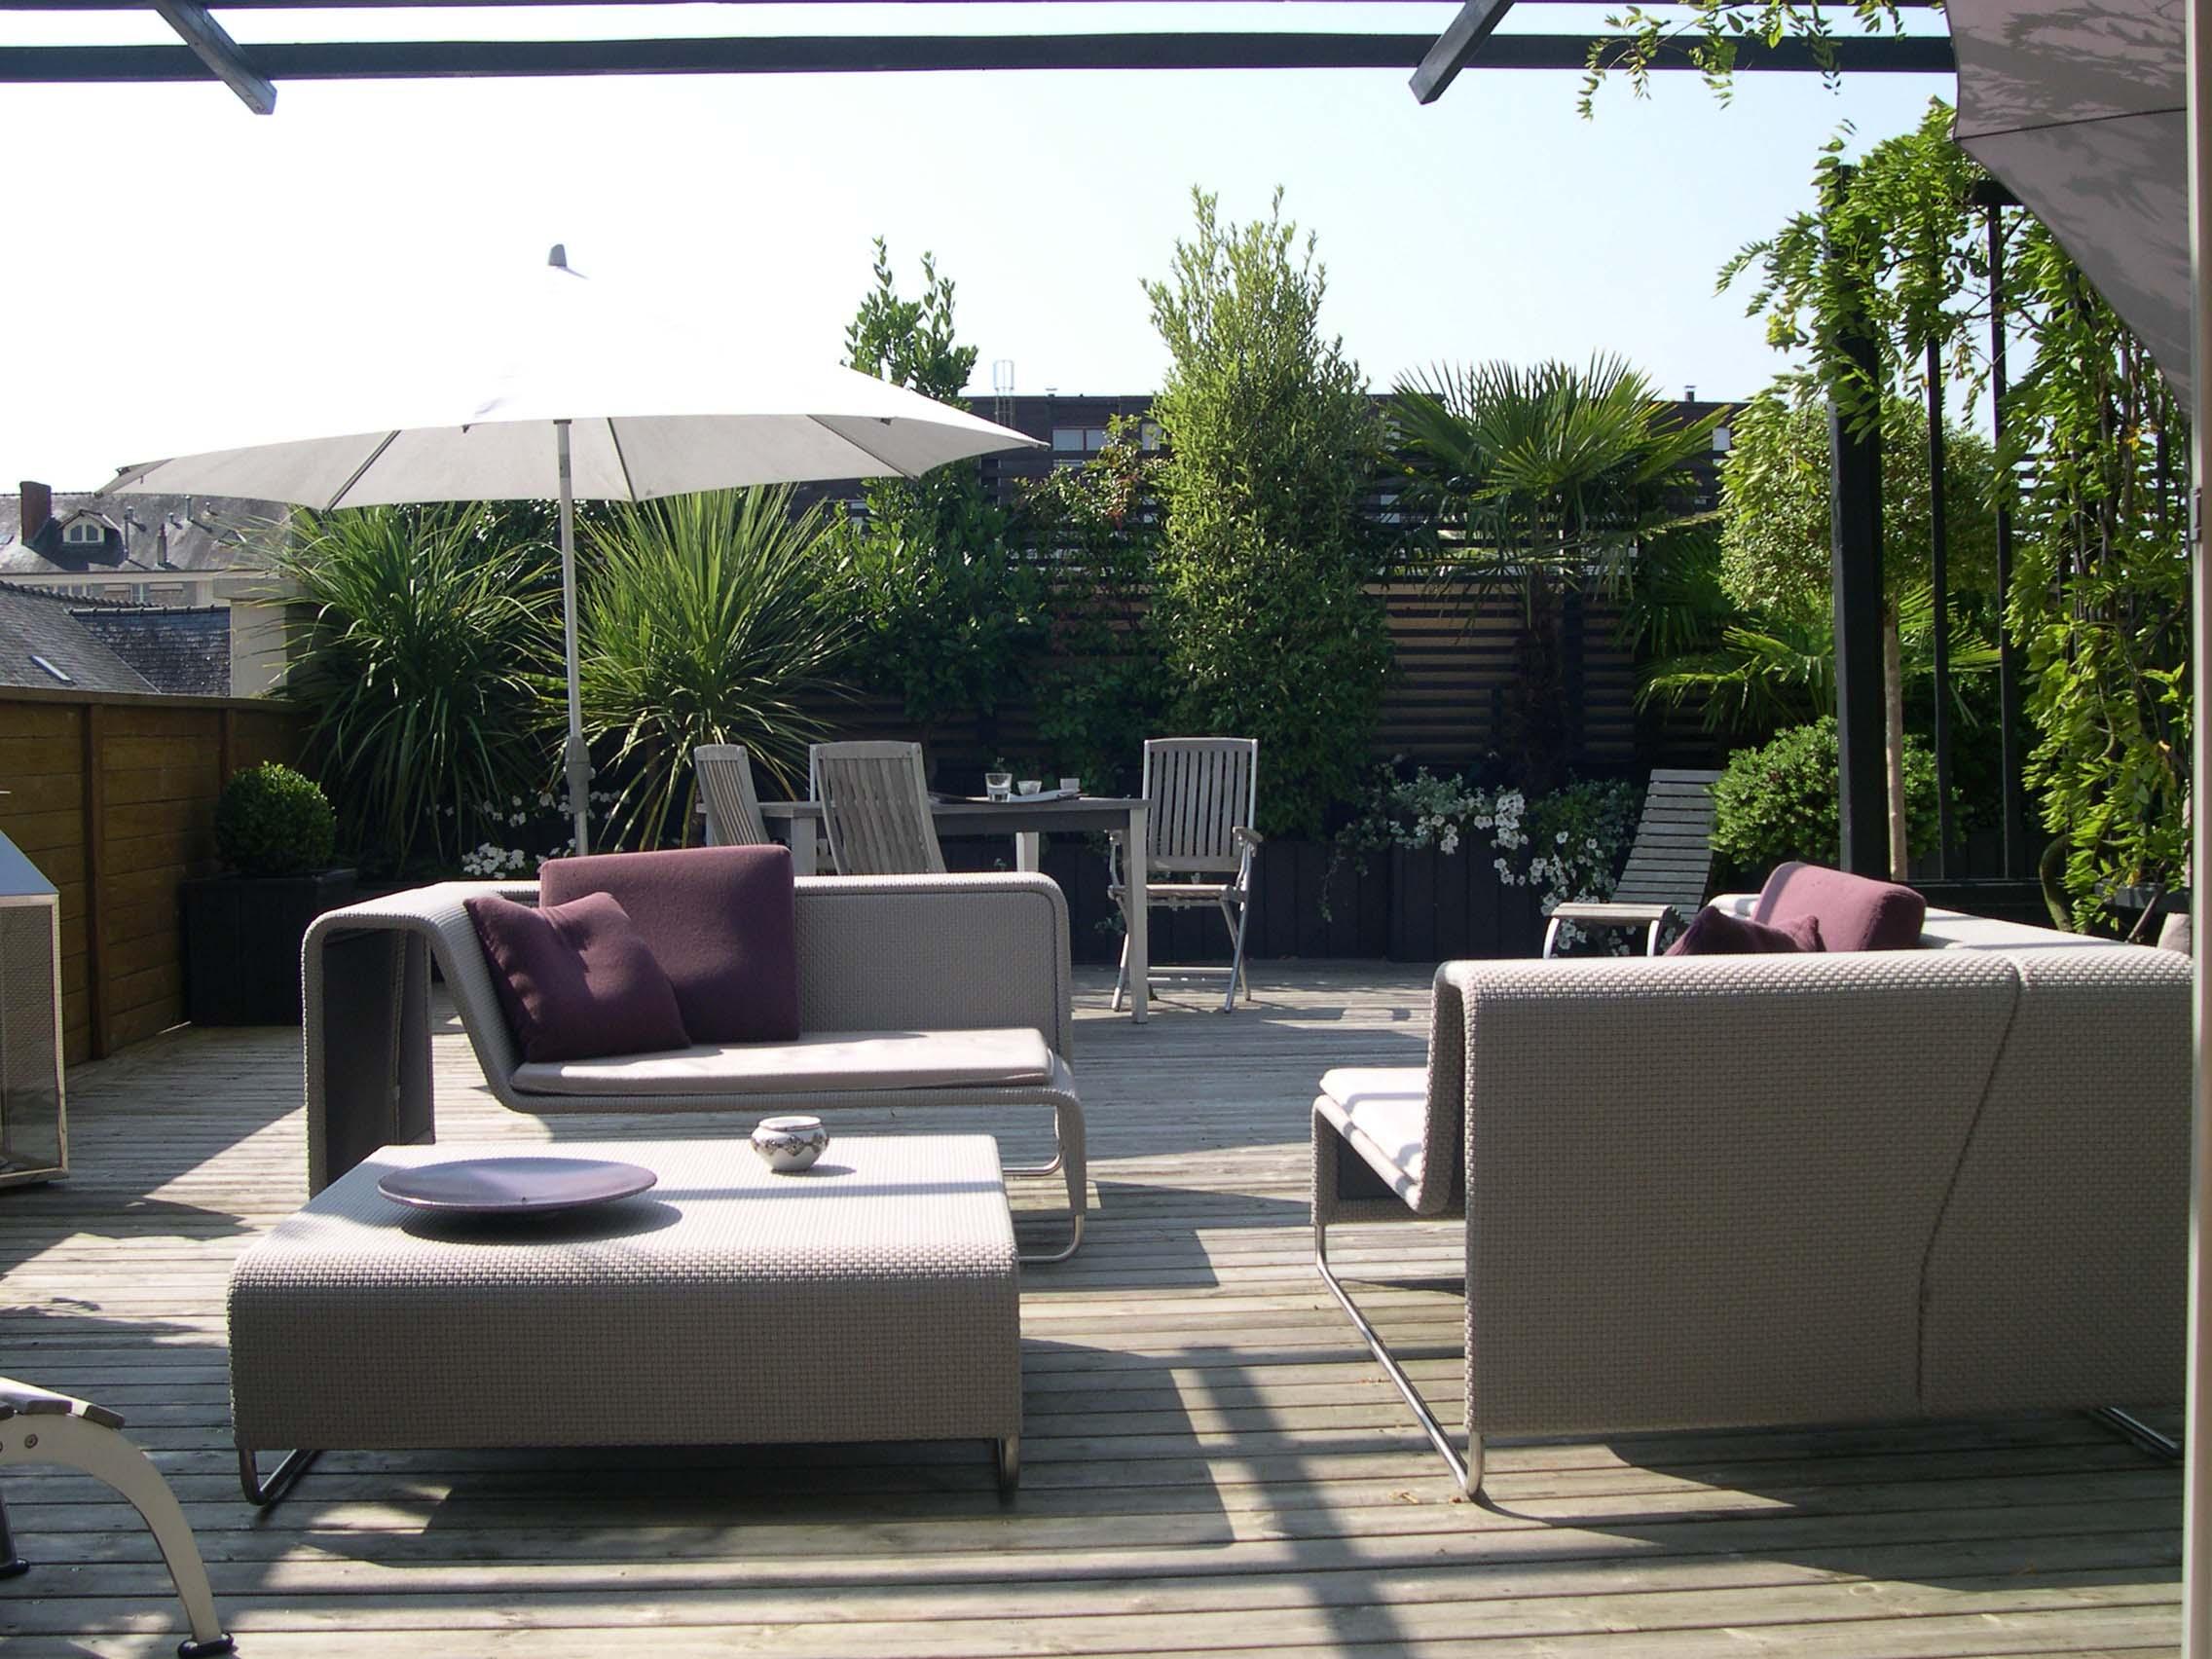 terrasses le jardin de poliphile. Black Bedroom Furniture Sets. Home Design Ideas